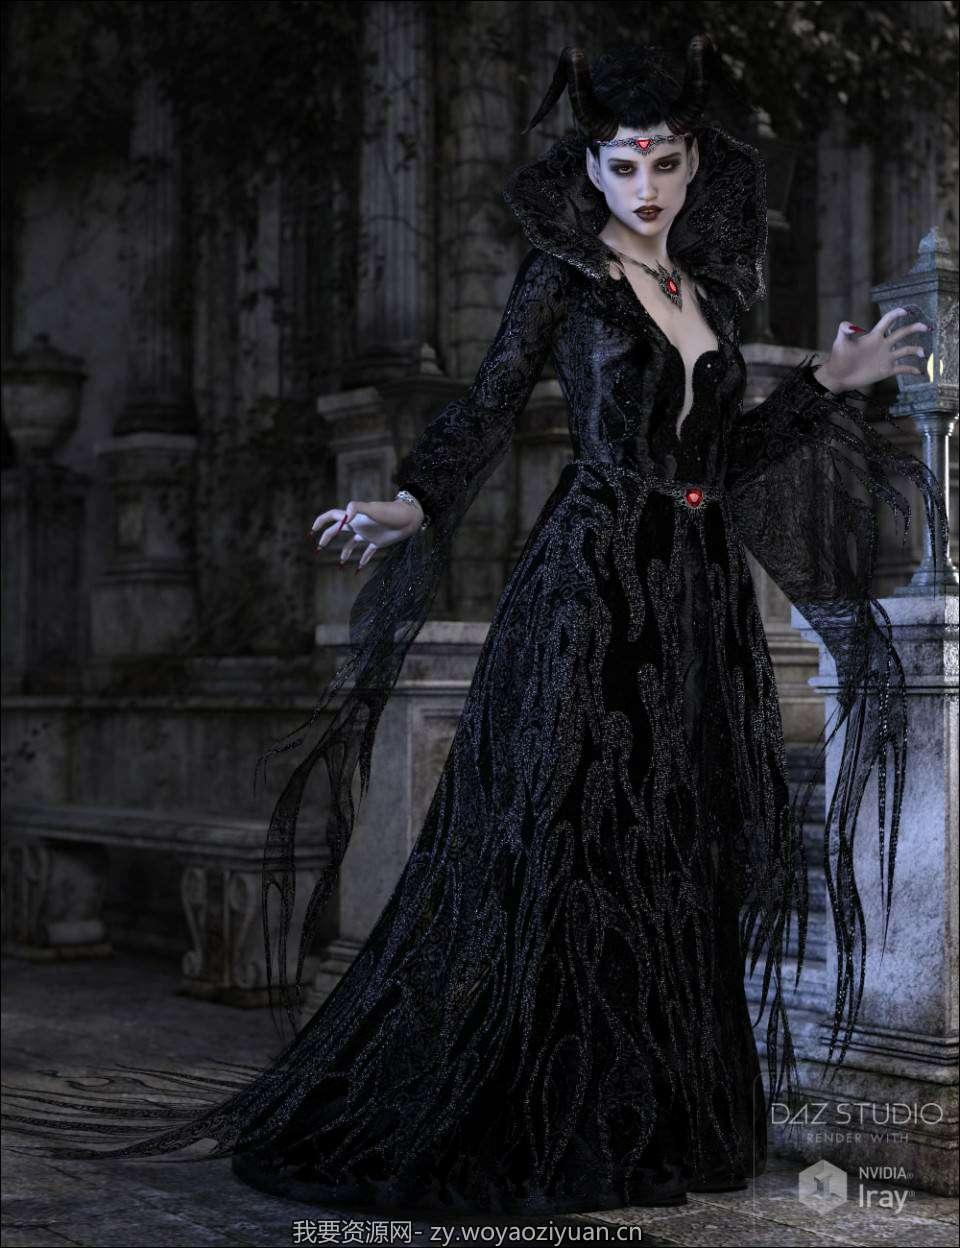 Princess of Darkness 2